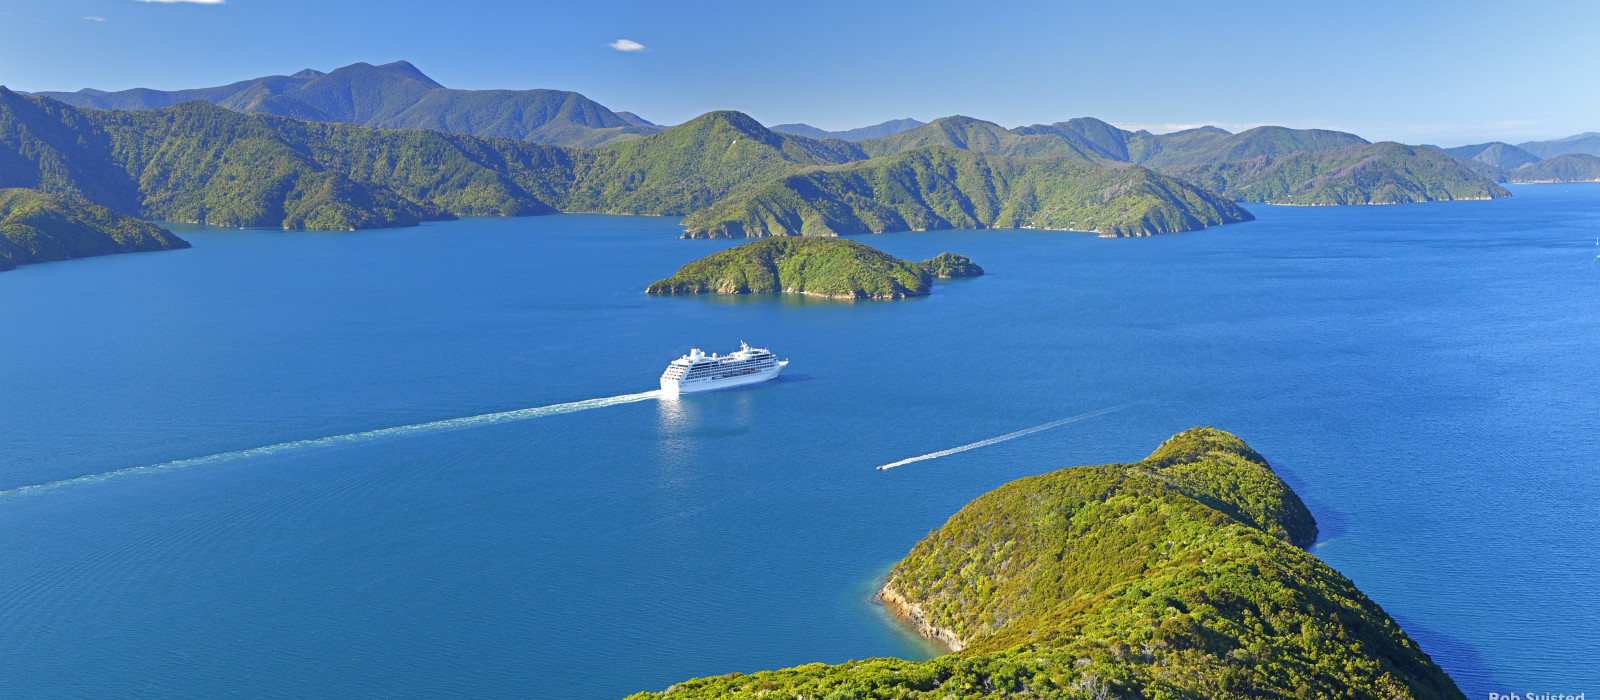 Reiseziel Marlborough Sounds Neuseeland